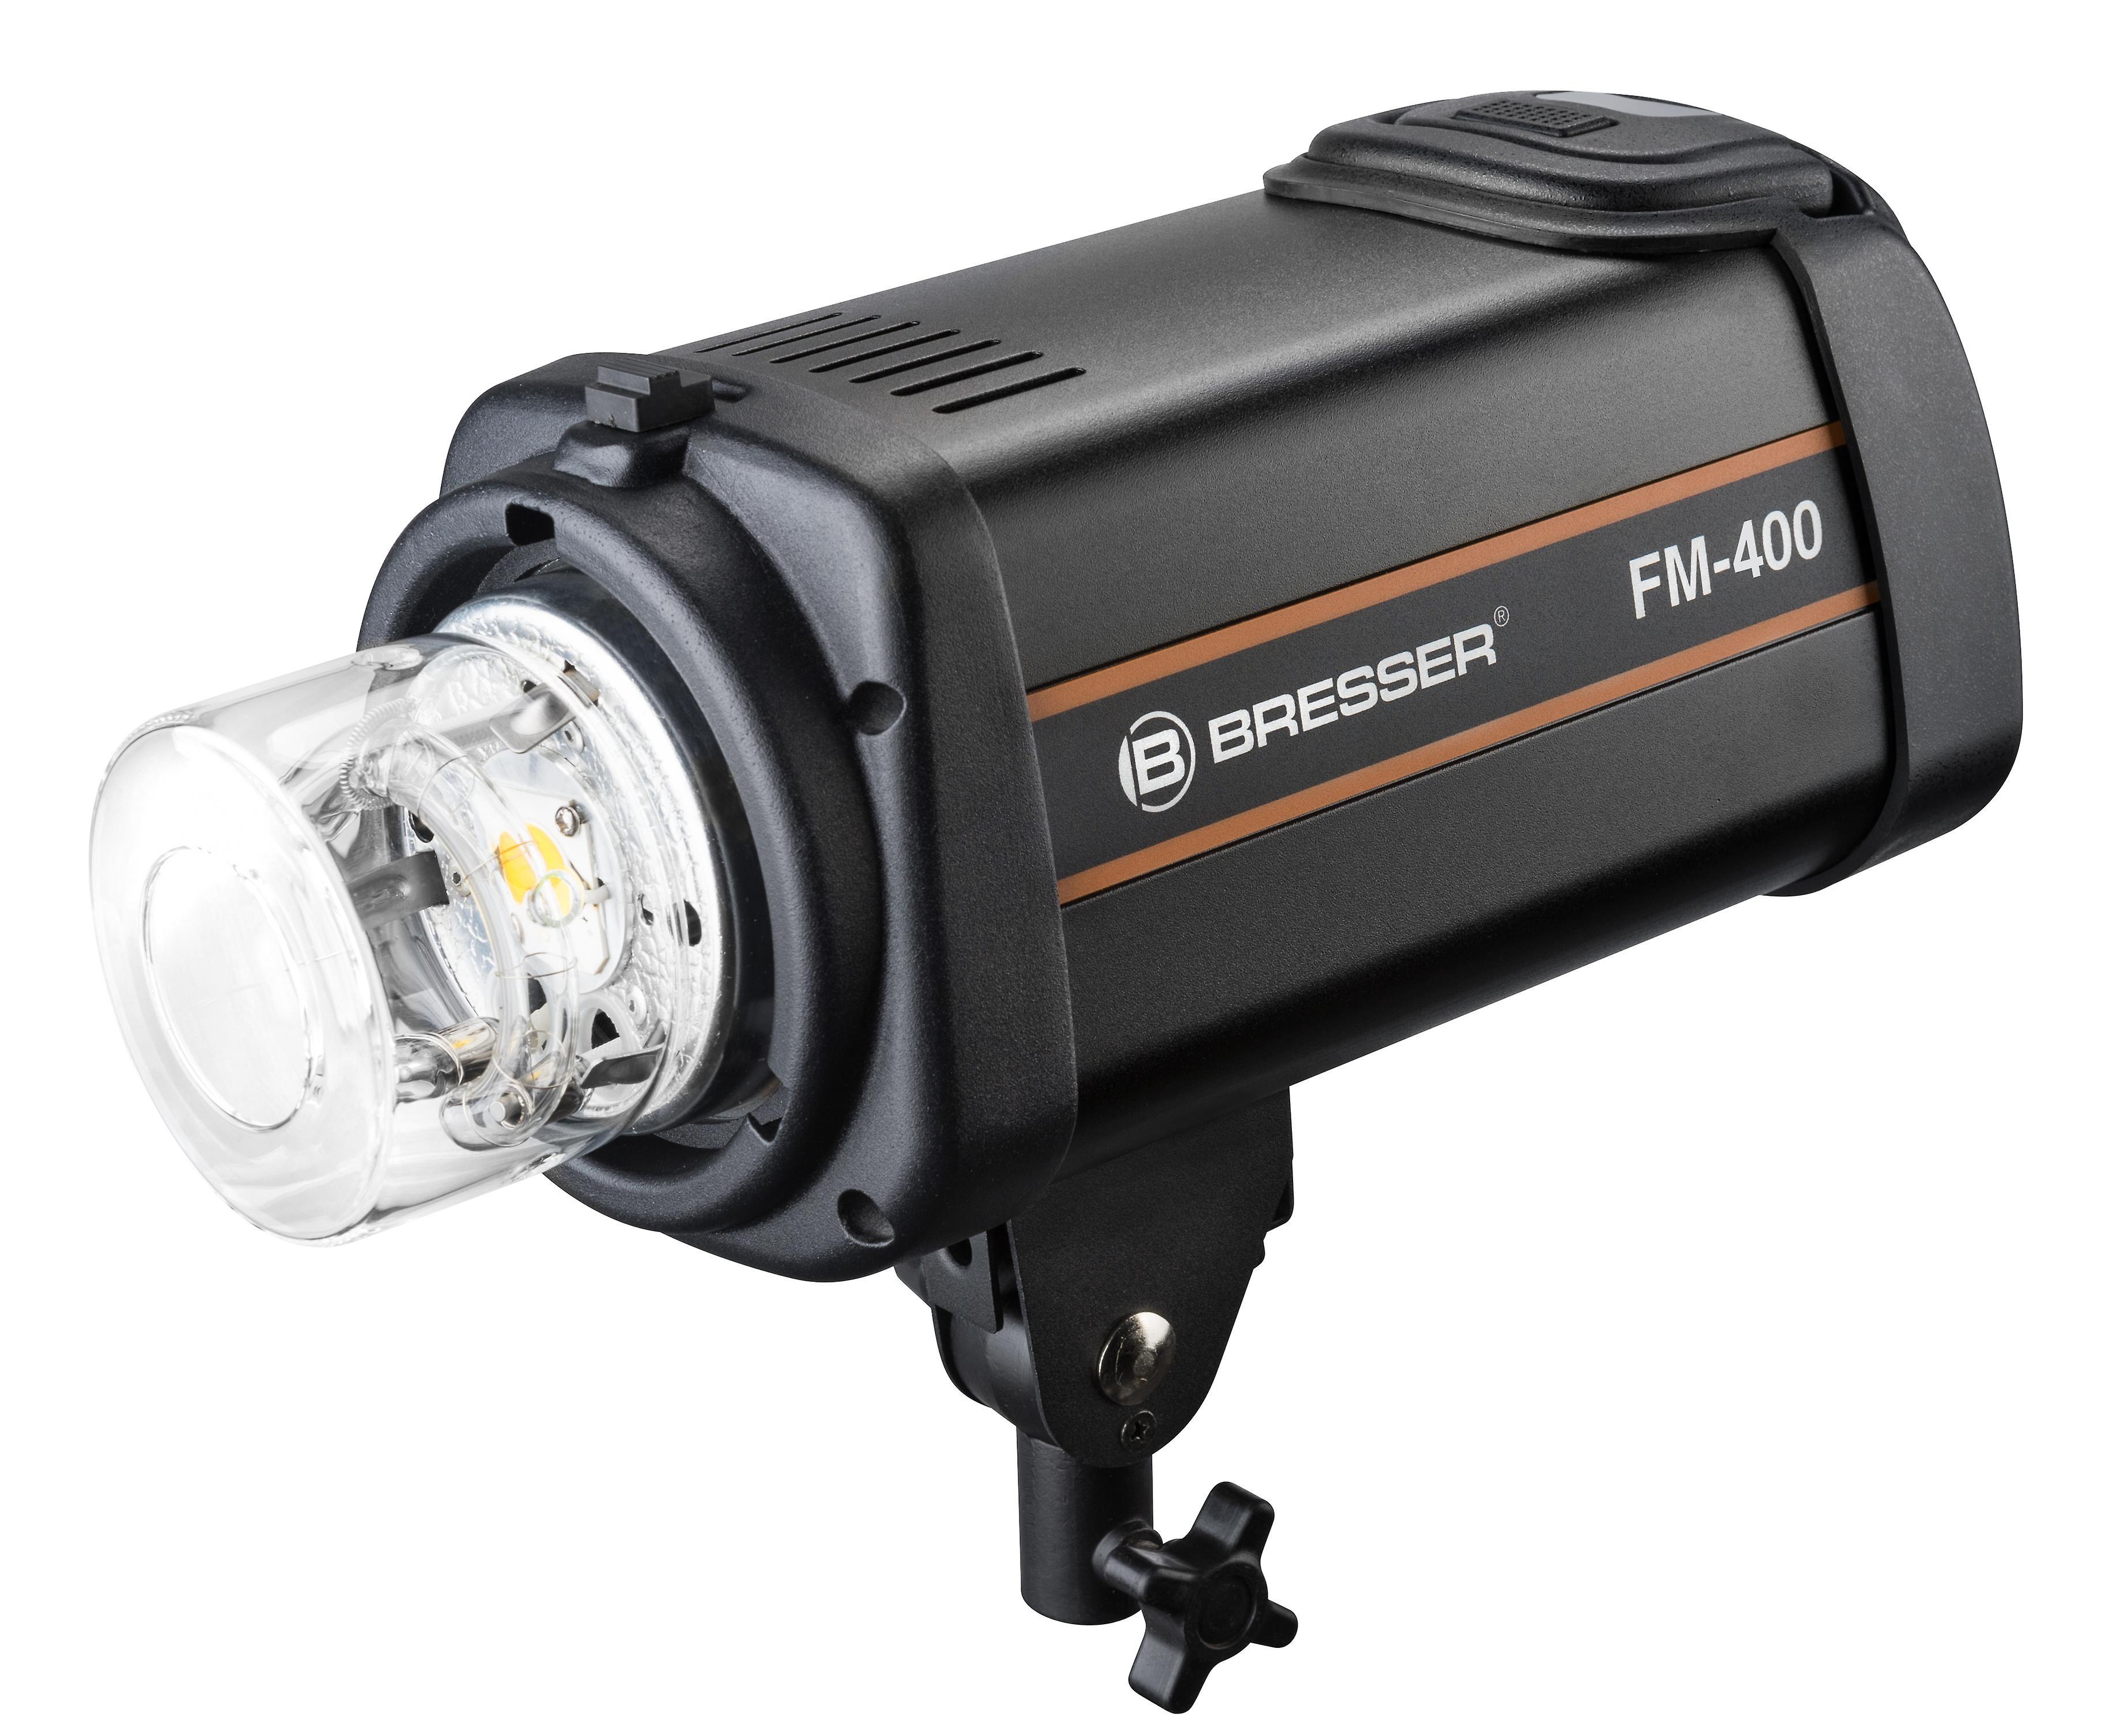 BRESSER FM-400 High Speed Studioblitz